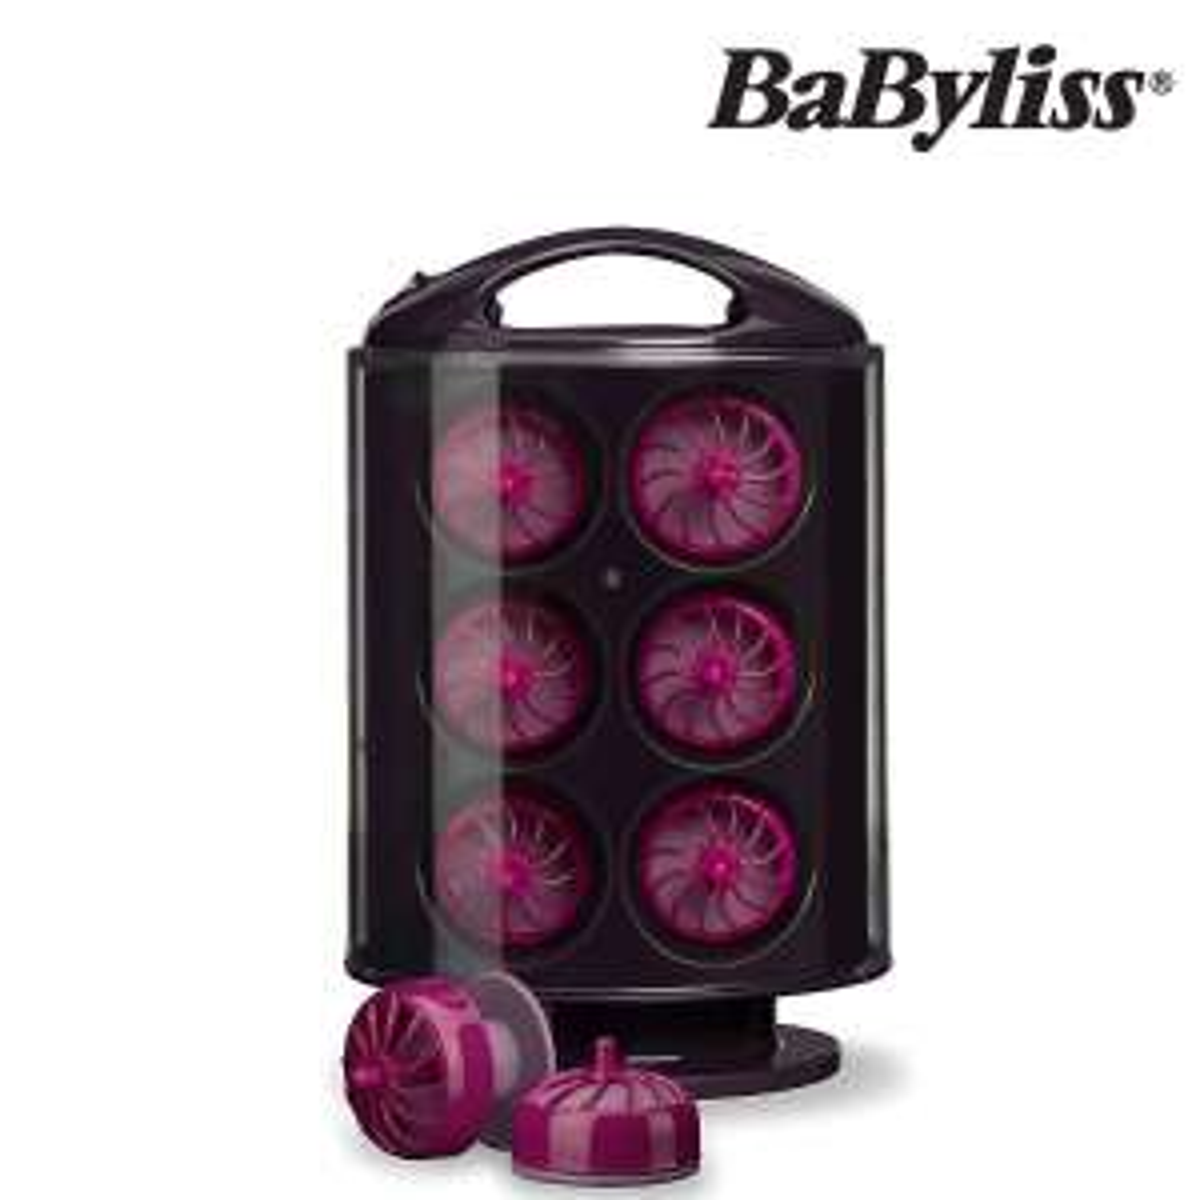 BaByliss 3663u Curl Pods Large Heated Rollers 3 Min. Heat-Up Time (As New) £20.50 delivered / 2 Sets for £18.45 each @ eBay / primeretailing